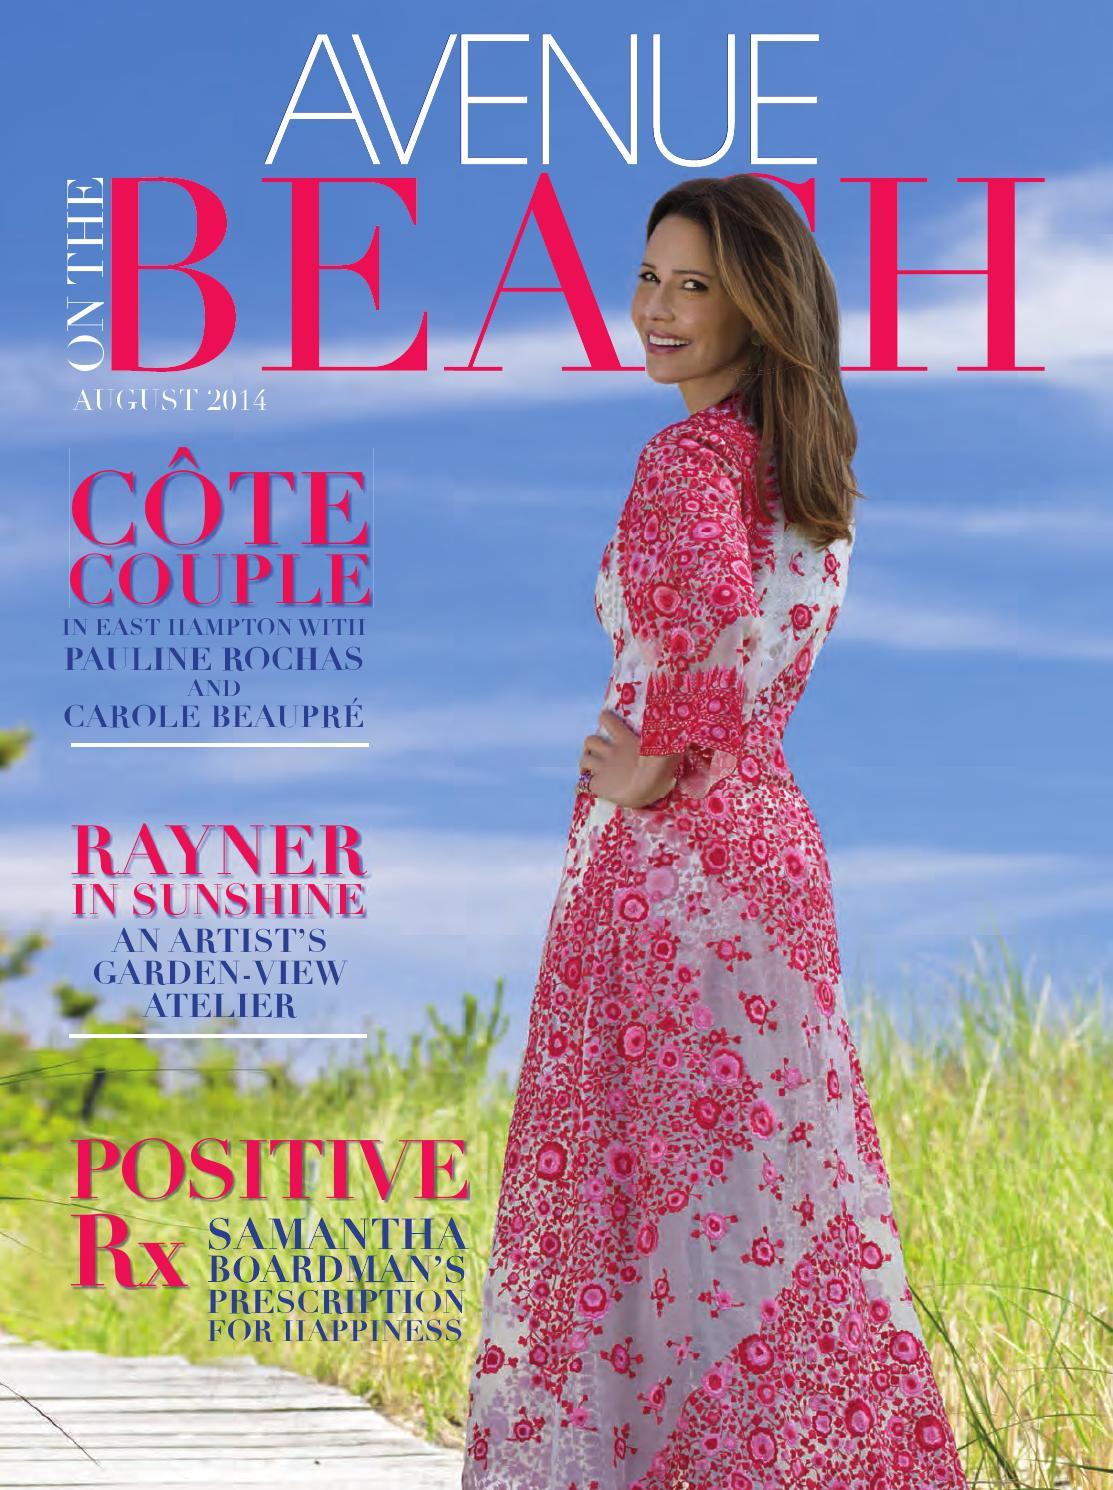 e5c0a05da6 AVENUE on the Beach August 2014 by AVENUE Magazine - issuu